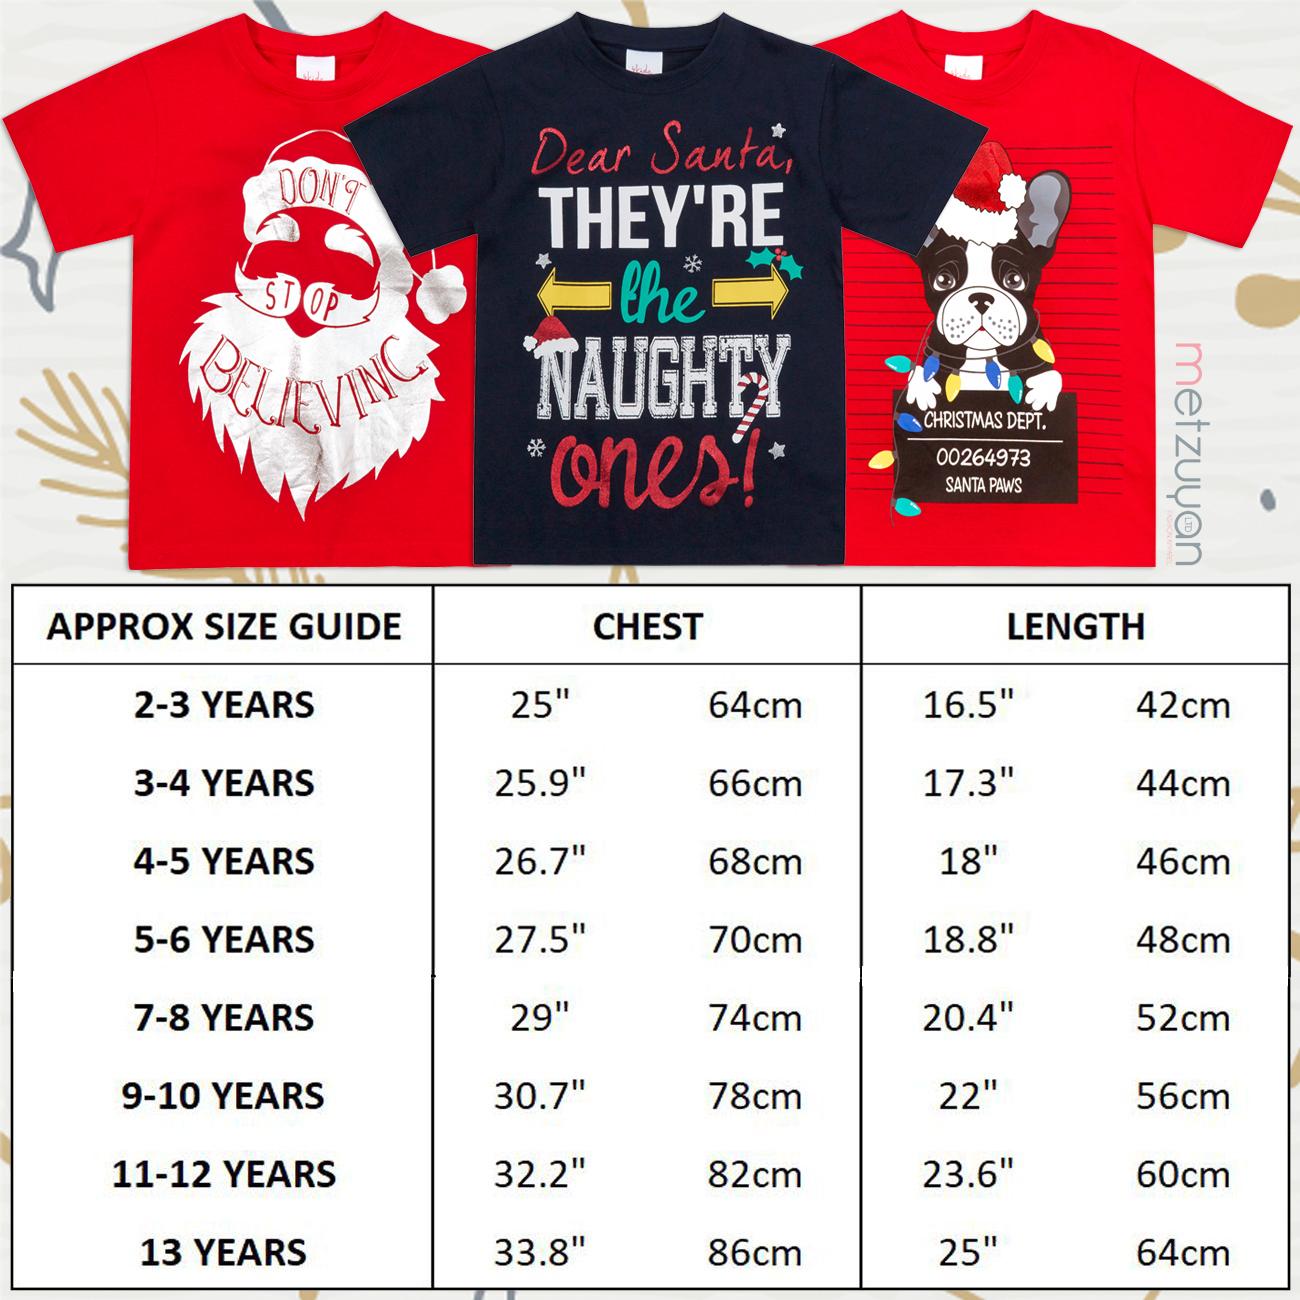 Childrens-Girls-Boys-Xmas-T-Shirts-Printed-Christmas-Design-100-Cotton-2-13-Yrs thumbnail 14